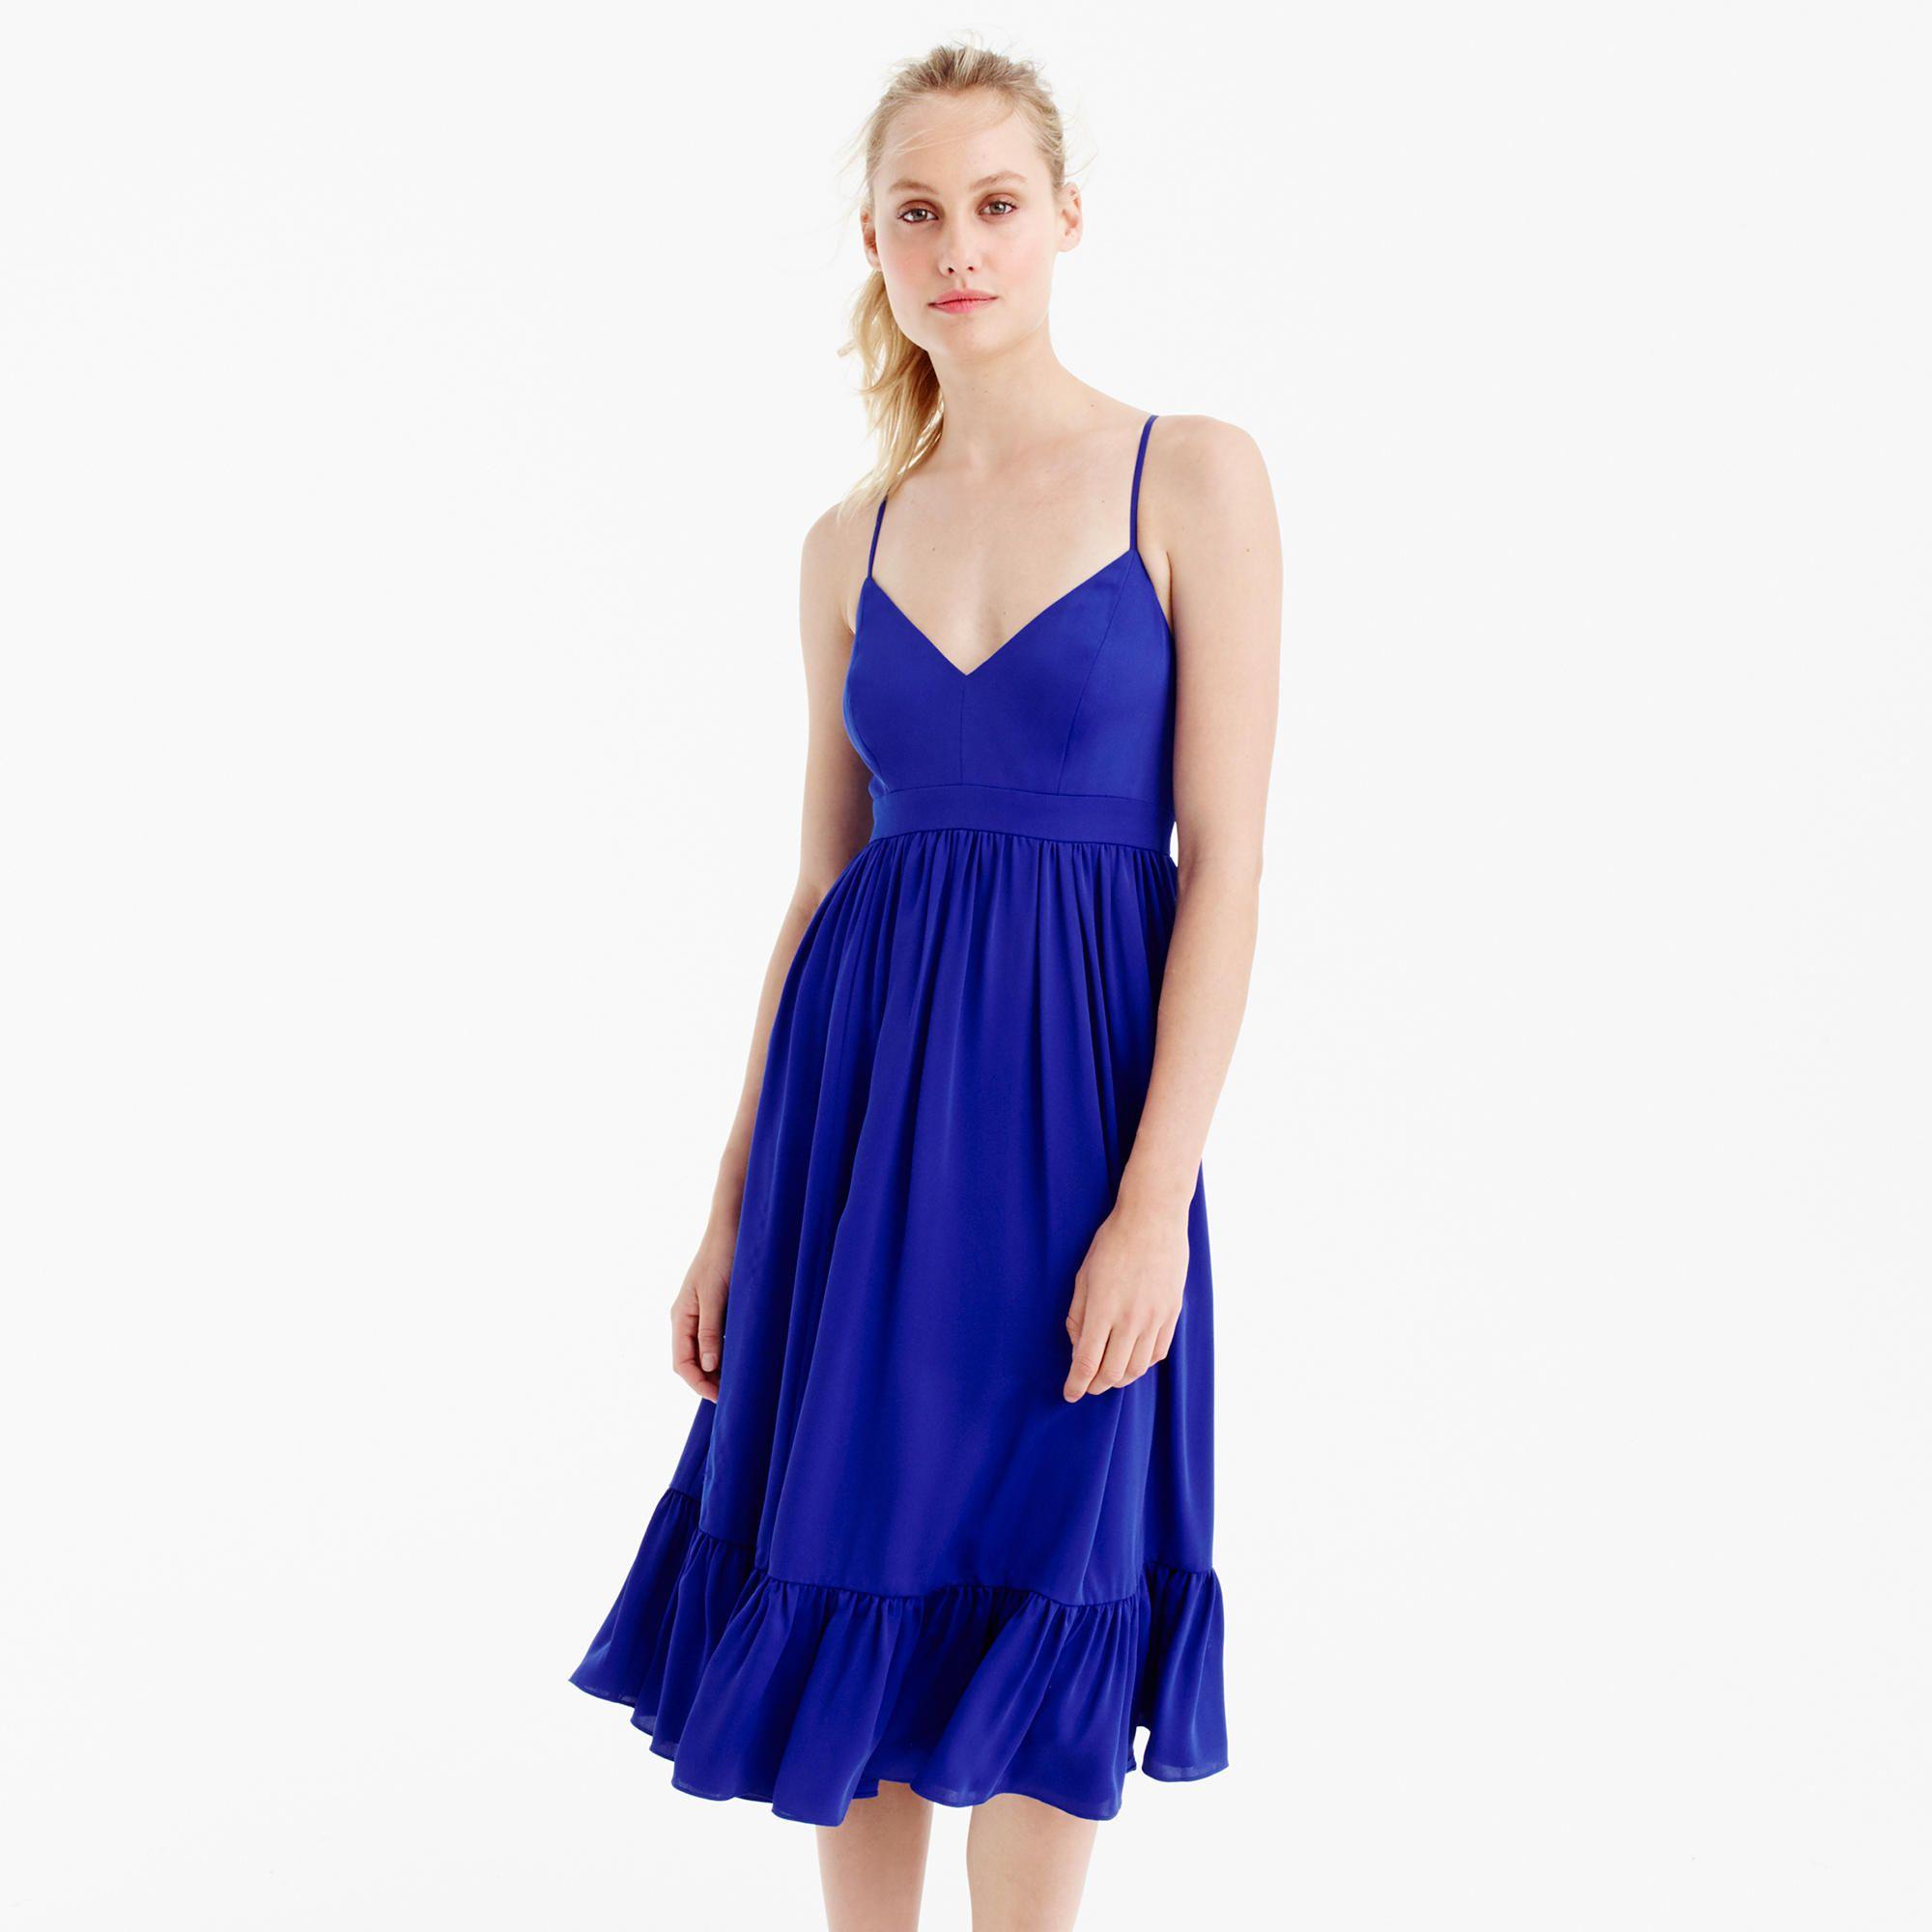 Tall drapey spaghetti-strap dress | Dresses | Pinterest